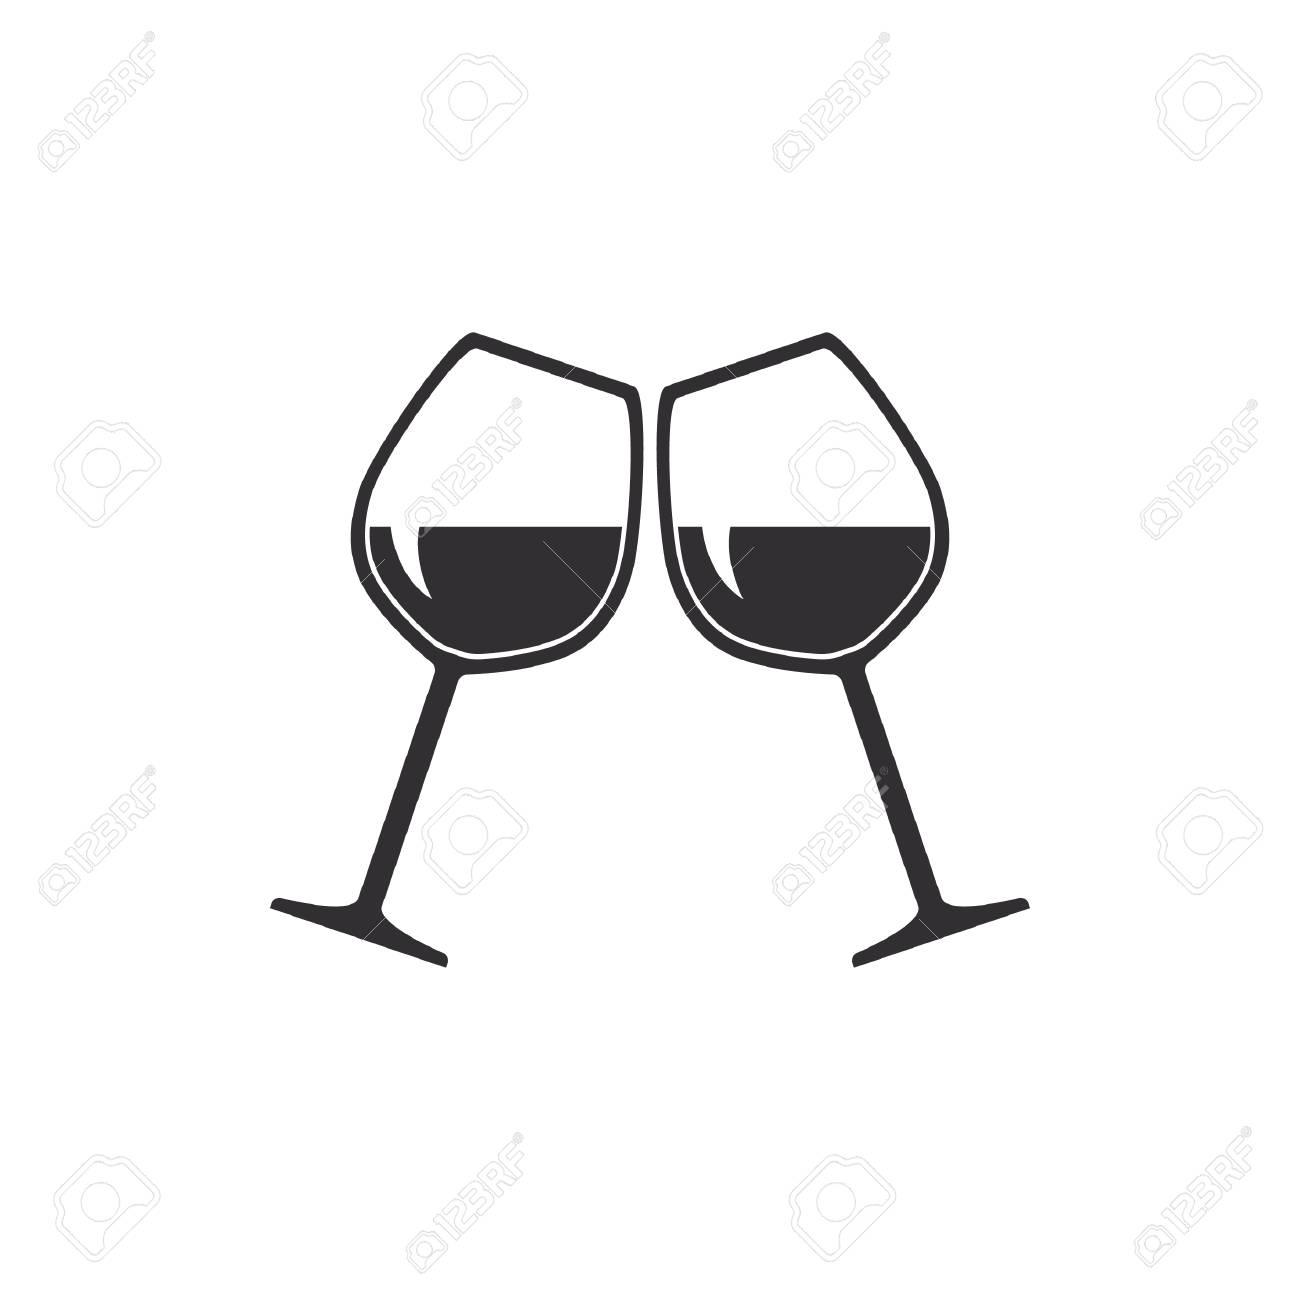 wine glasses - 52556628